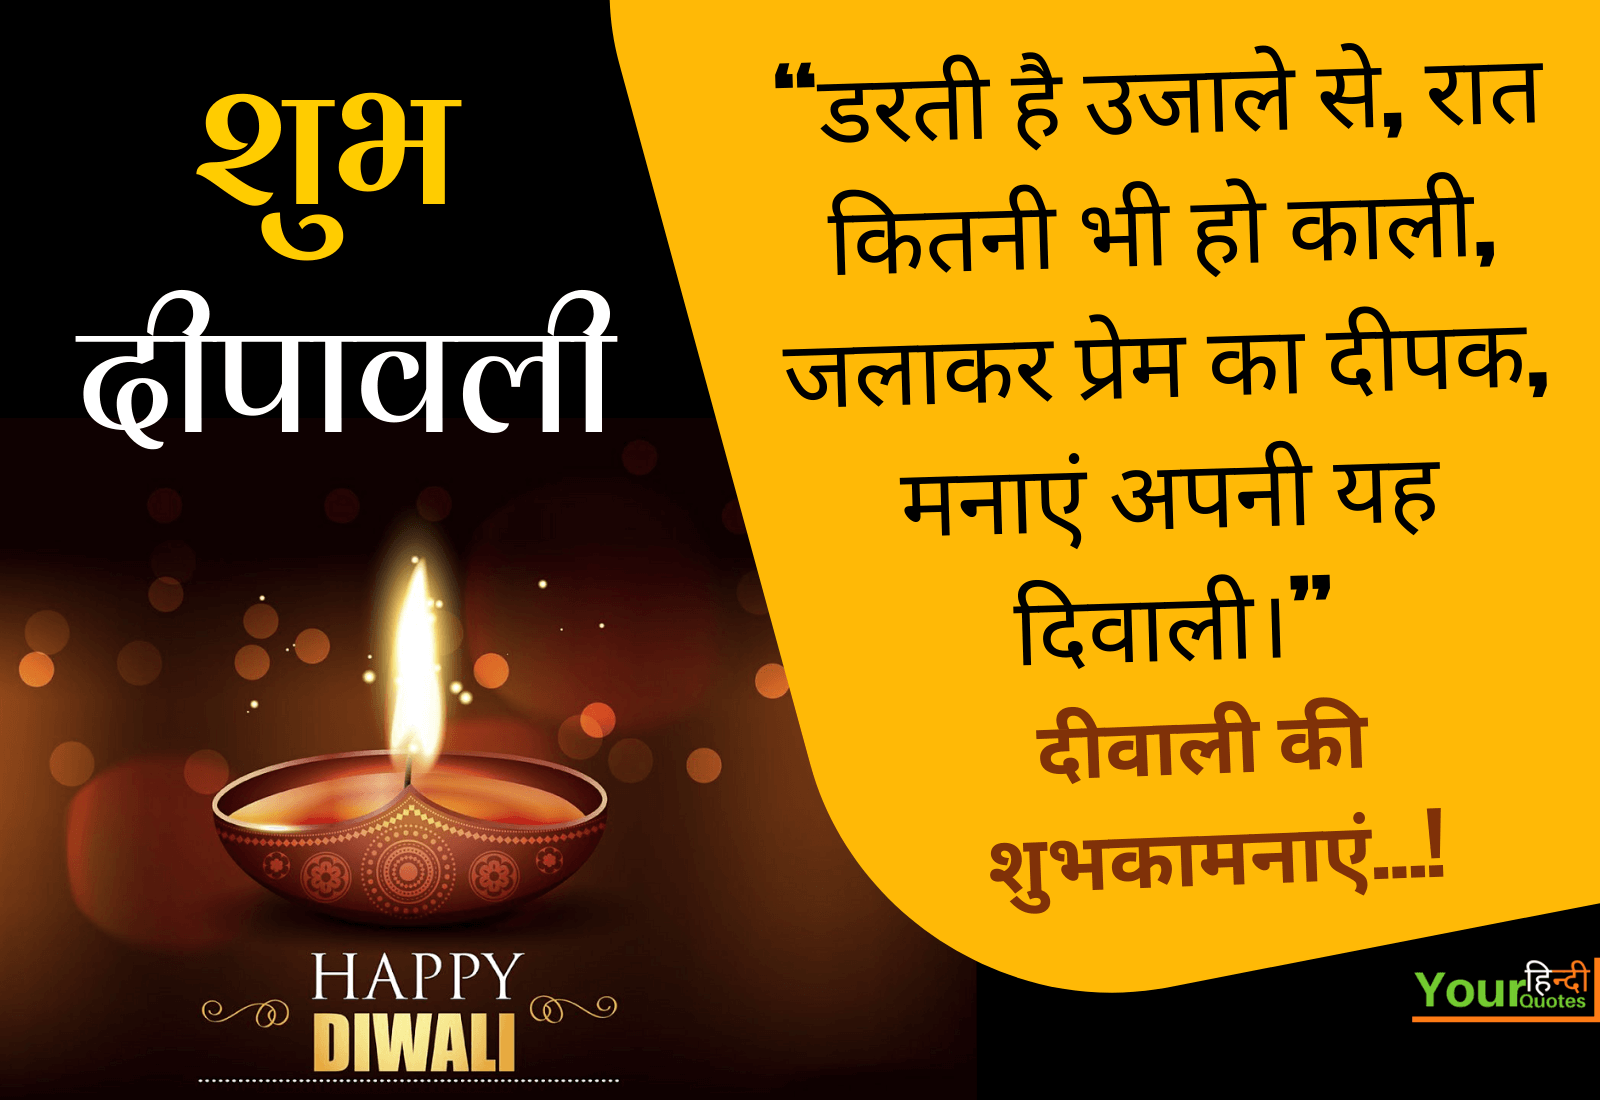 Hindi Diwali Wishes Photos